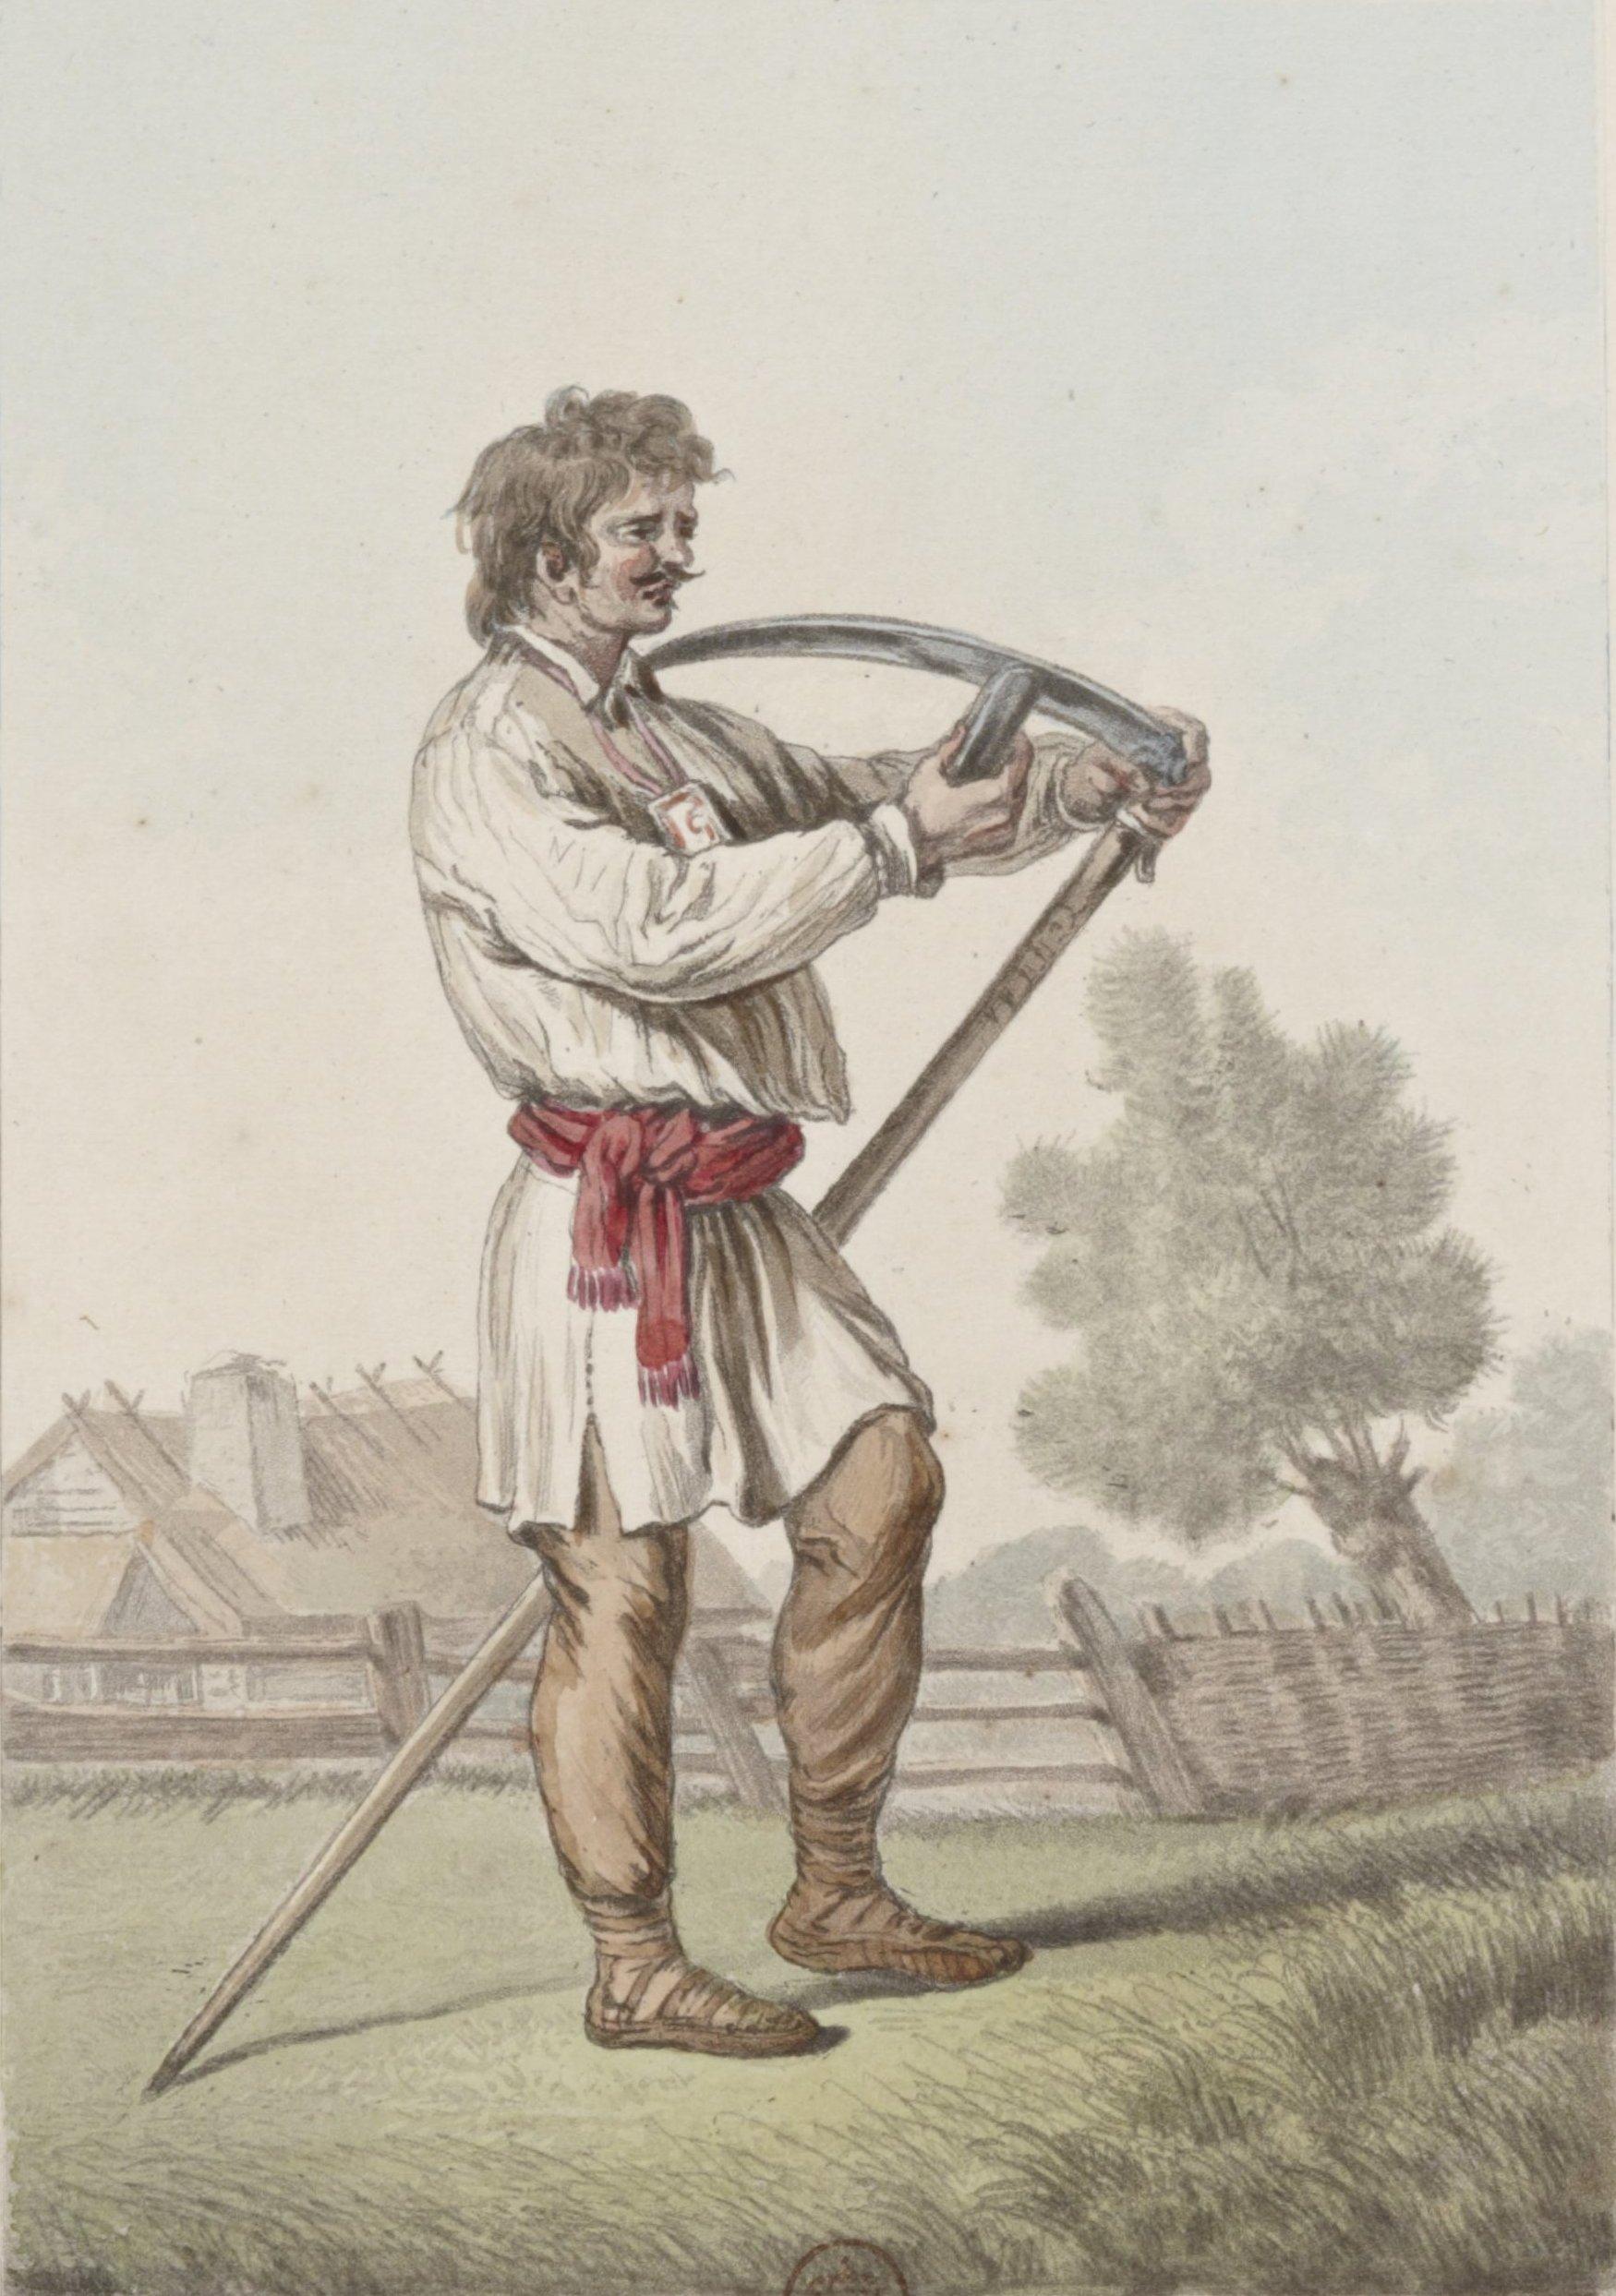 Drawn scythe farmer Scythe Military Wiki powered Wikia